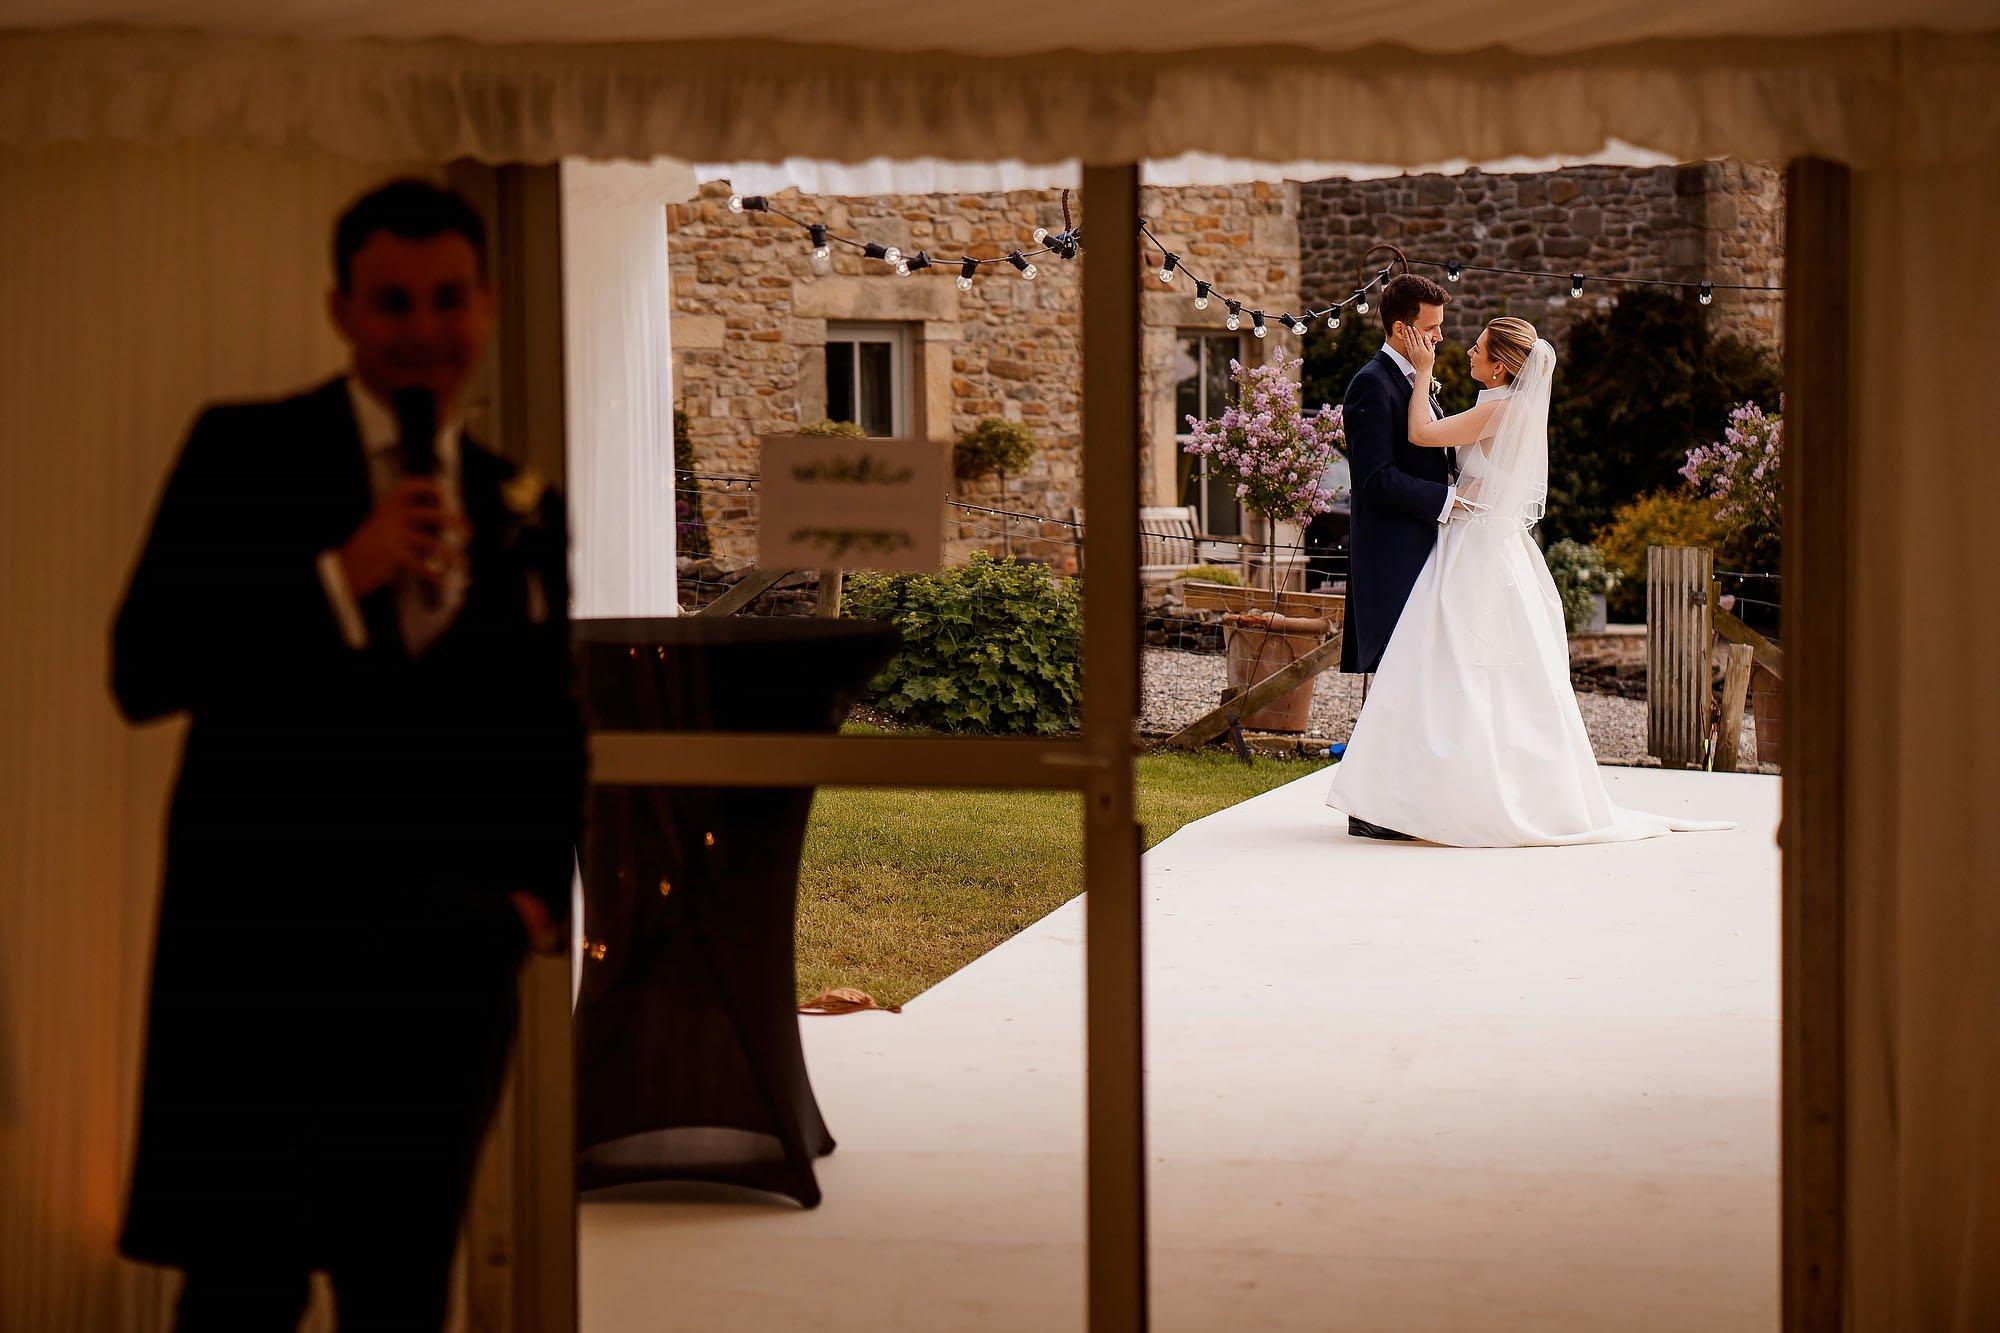 Uk wedding photographers - arj photography®